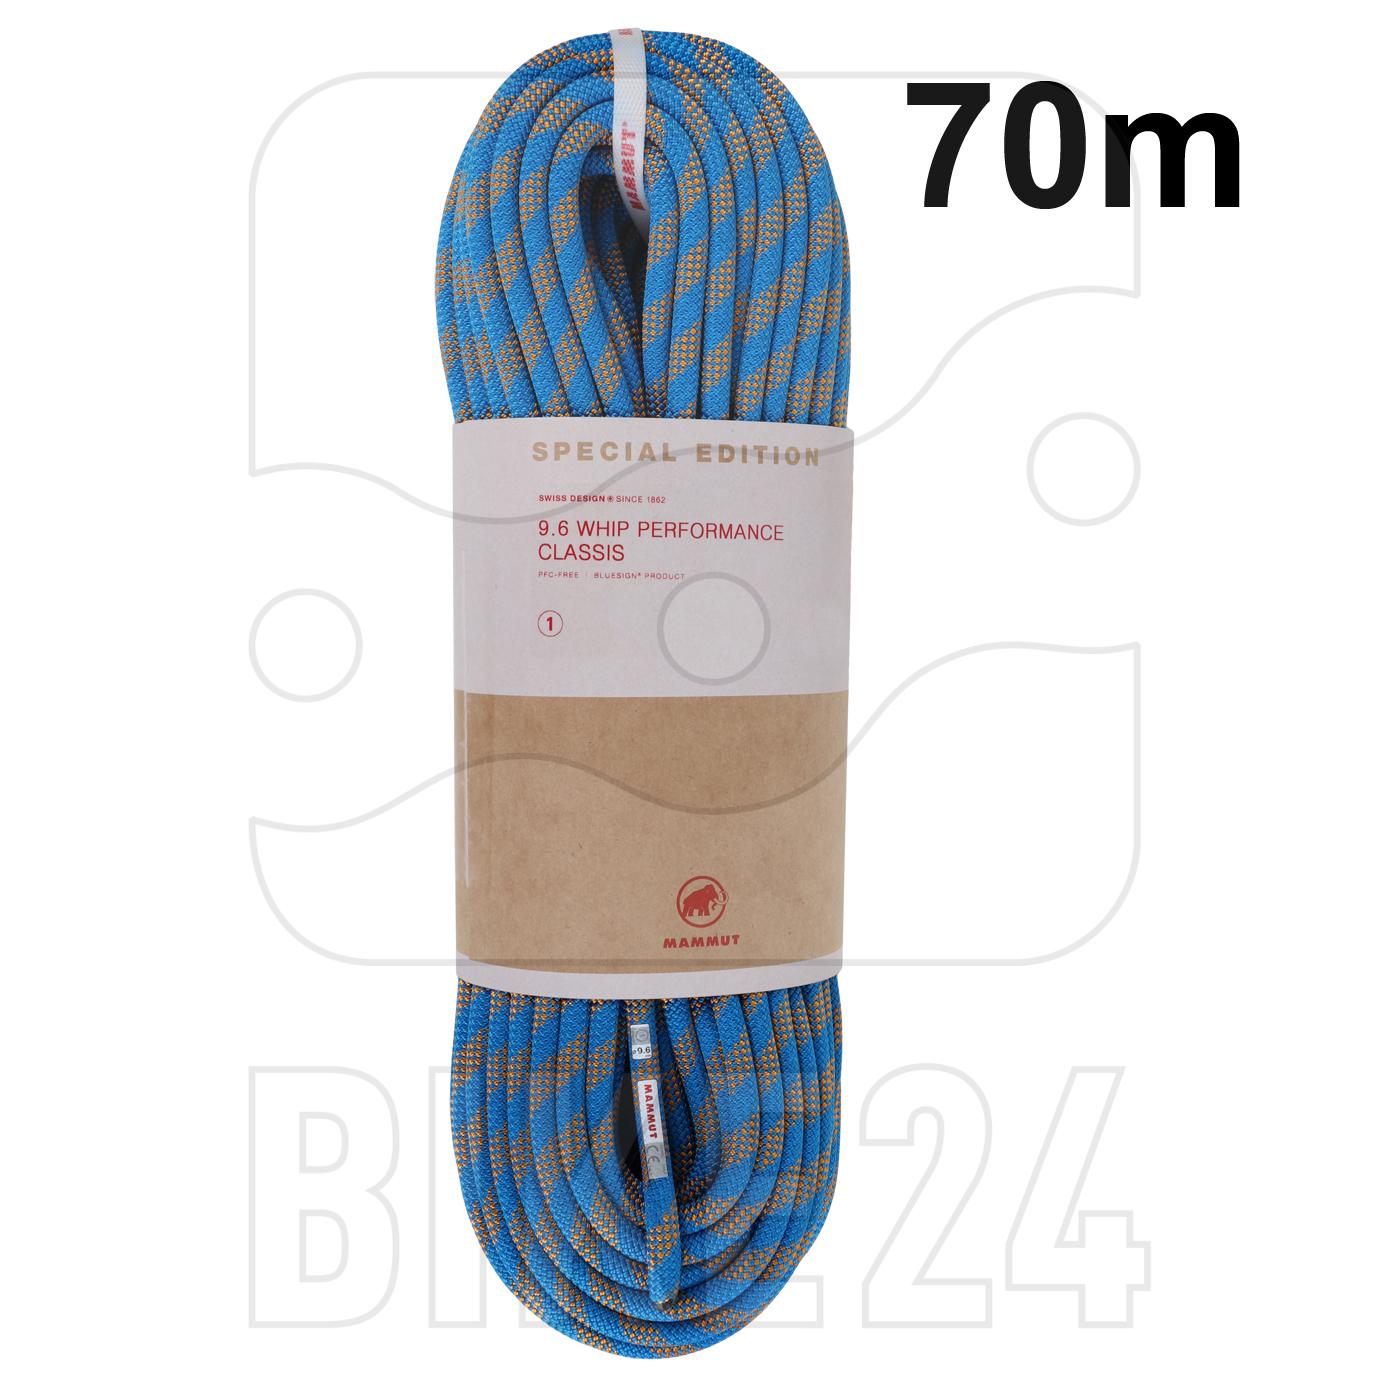 Mammut 9.6 Whip Single Rope BIKE24 Edition - 70m